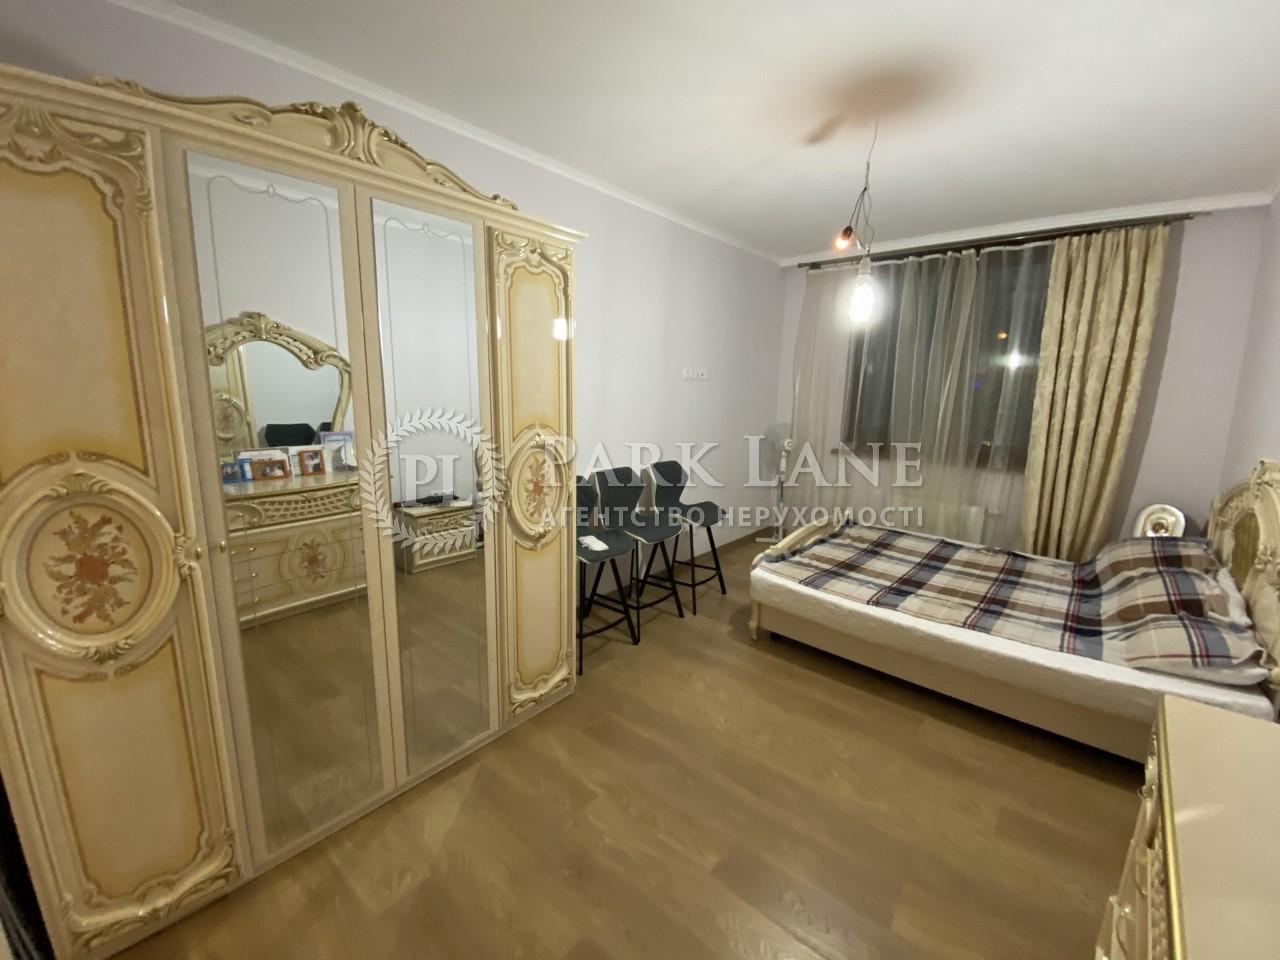 Квартира R-39276, Чавдар Елизаветы, 13, Киев - Фото 7